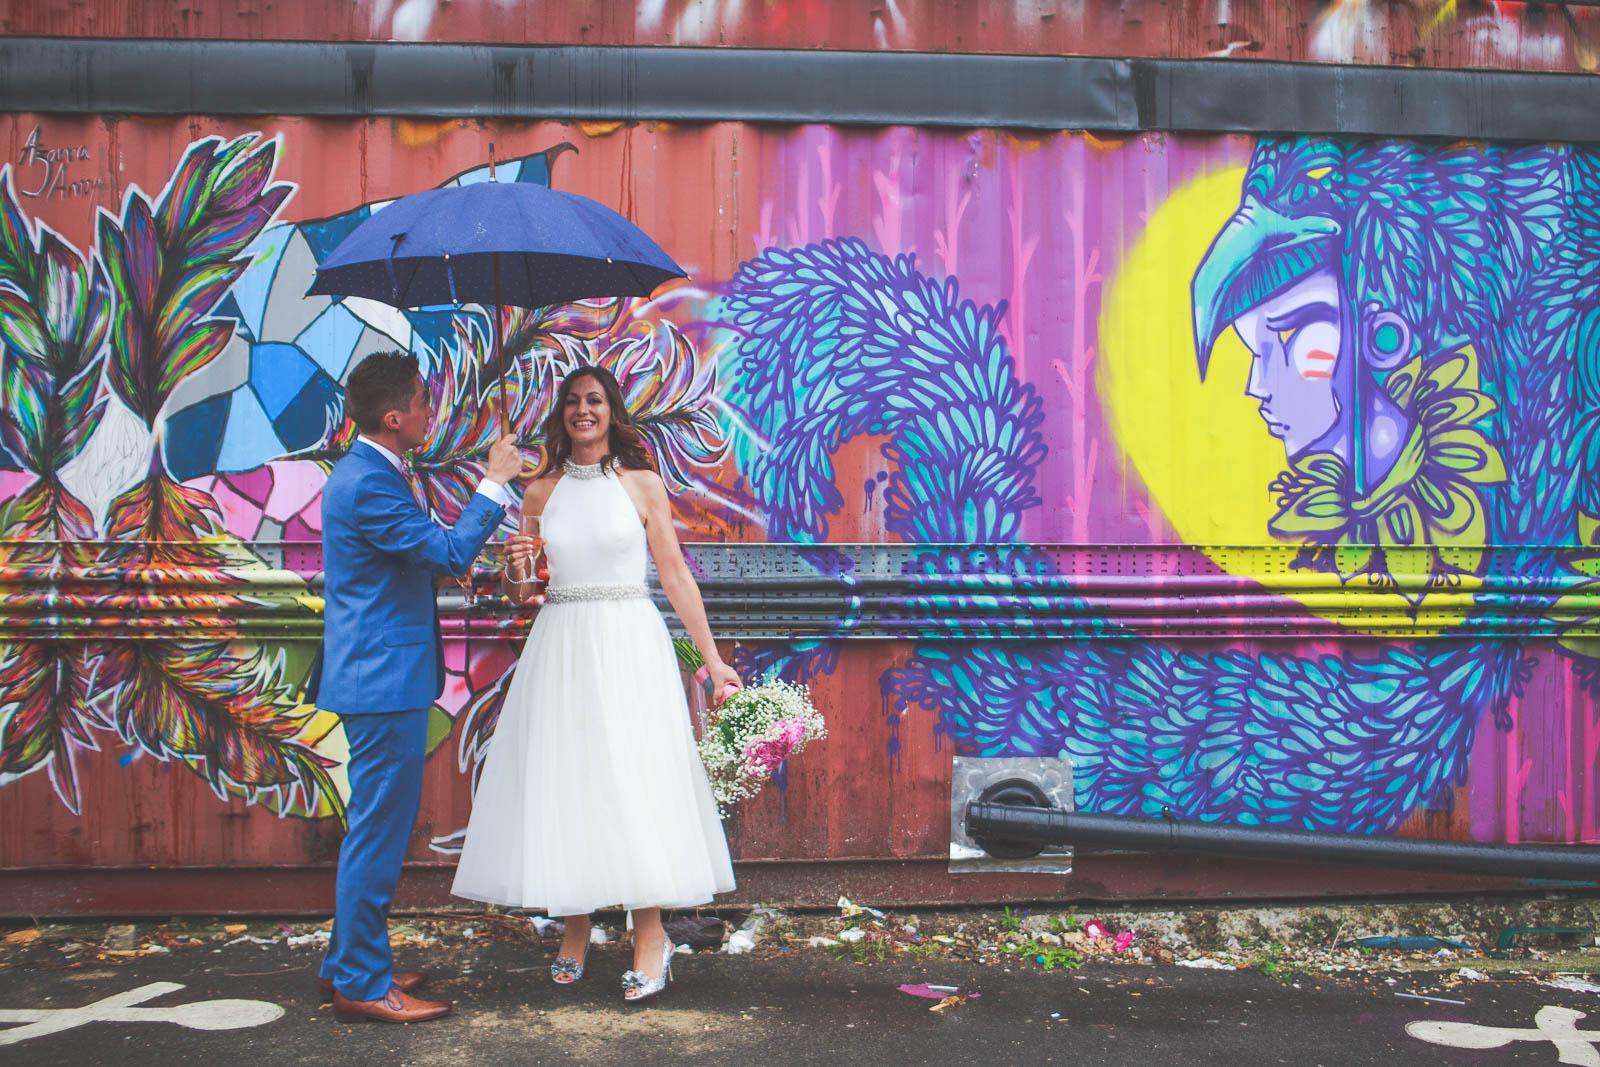 Quirky Venue, Non-traditional wedding planner, London Wedding coordination, Bespoke weddings, Brixton East 1871 Wedding, informal, Stylish wedding, Warehouse wedding, Dry hire venue